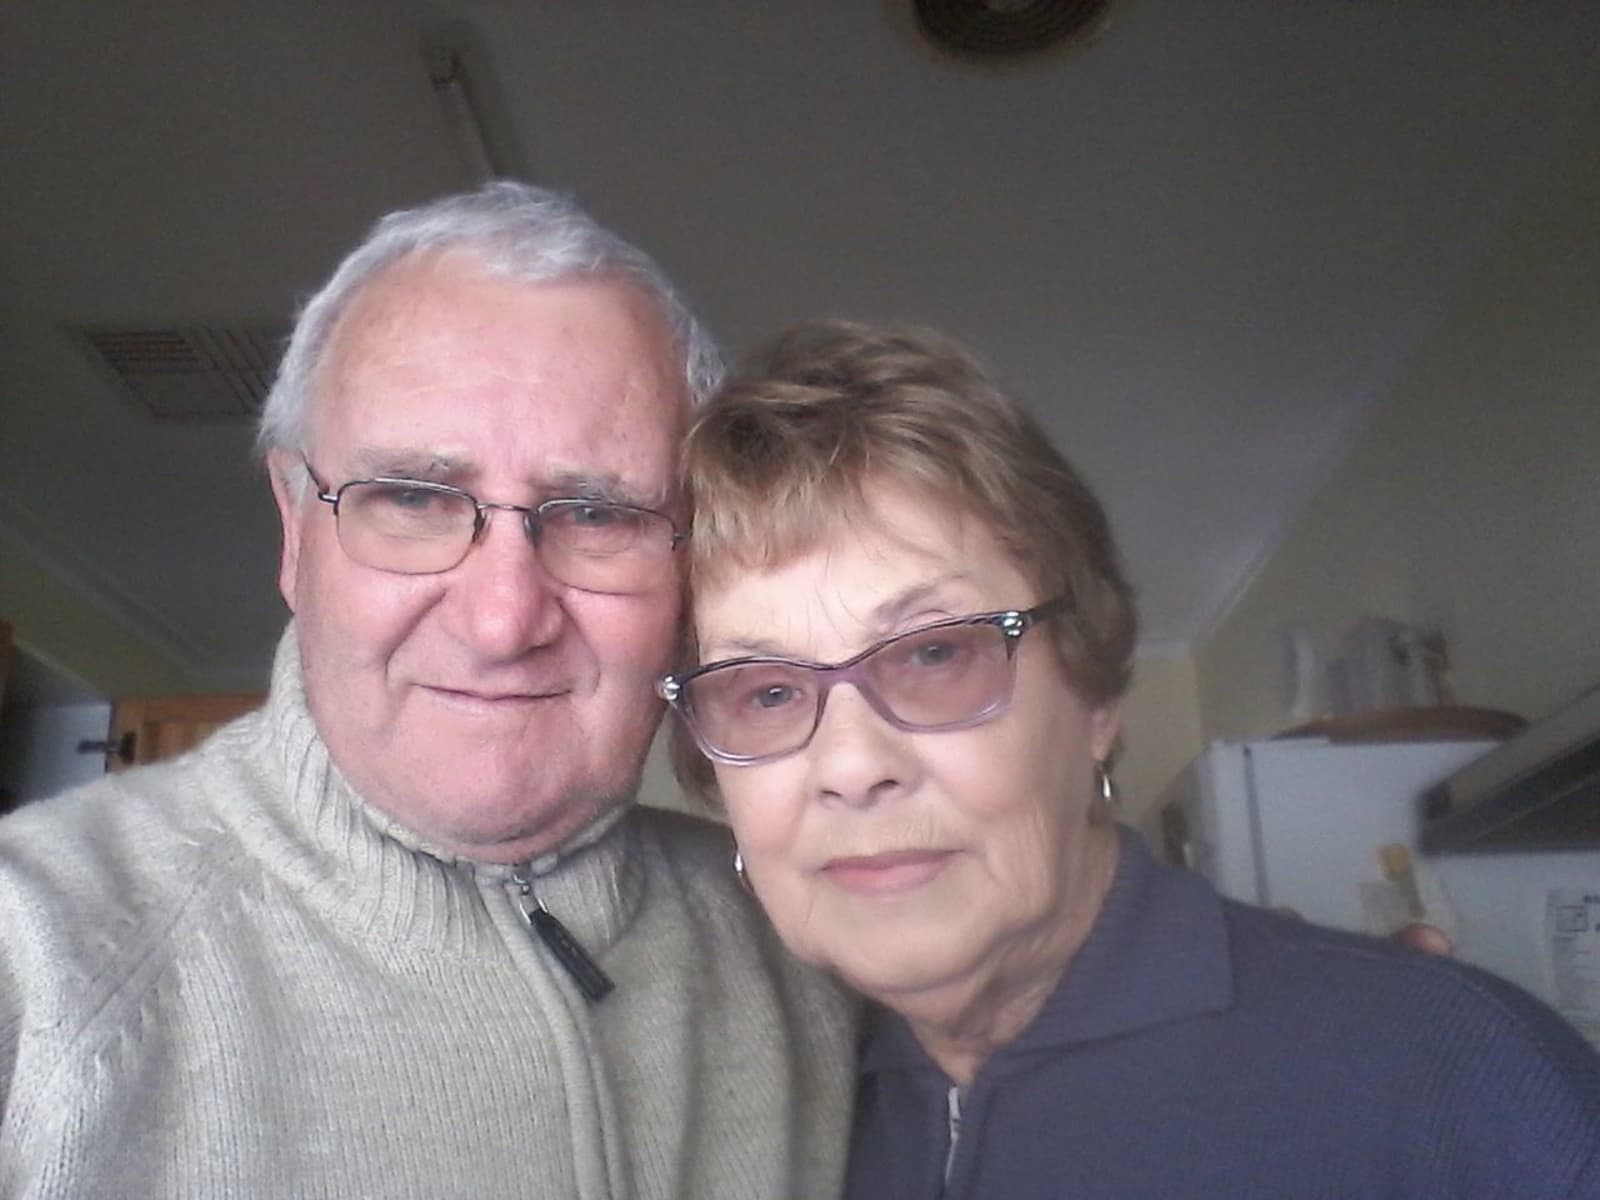 Ralph & Lyn from Bakery Hill, Victoria, Australia